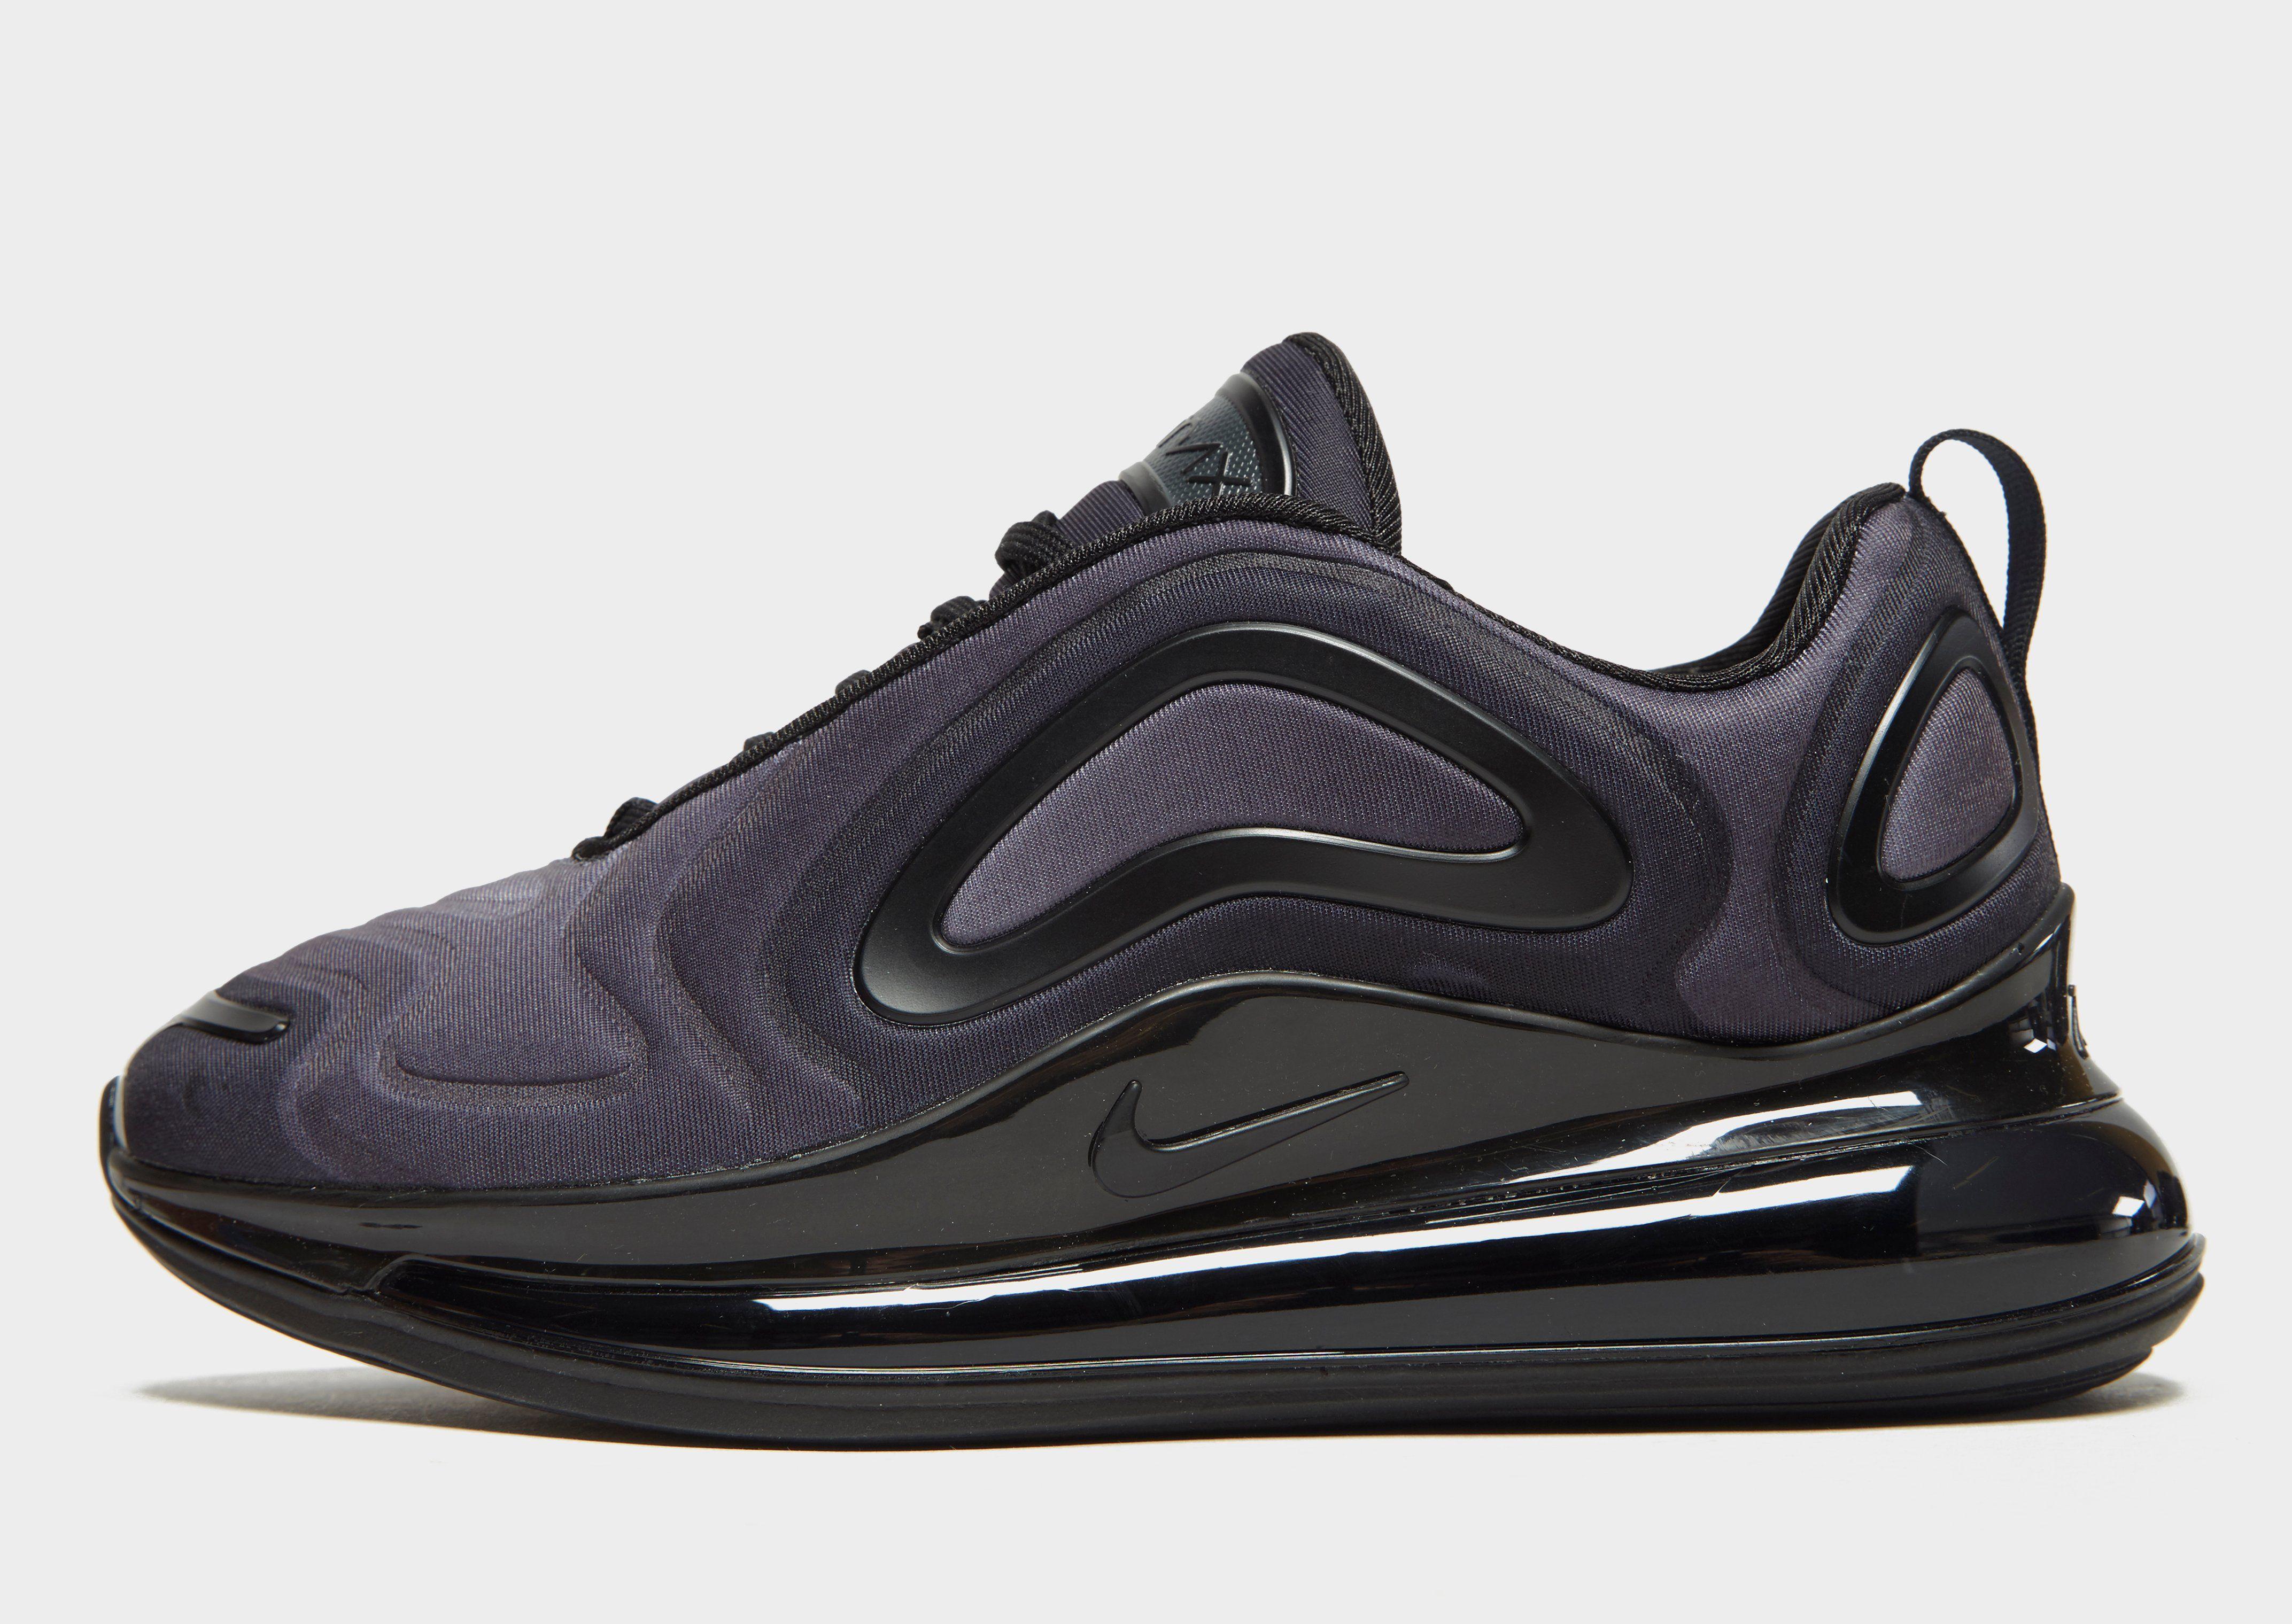 Nike Air Max 720 Women's